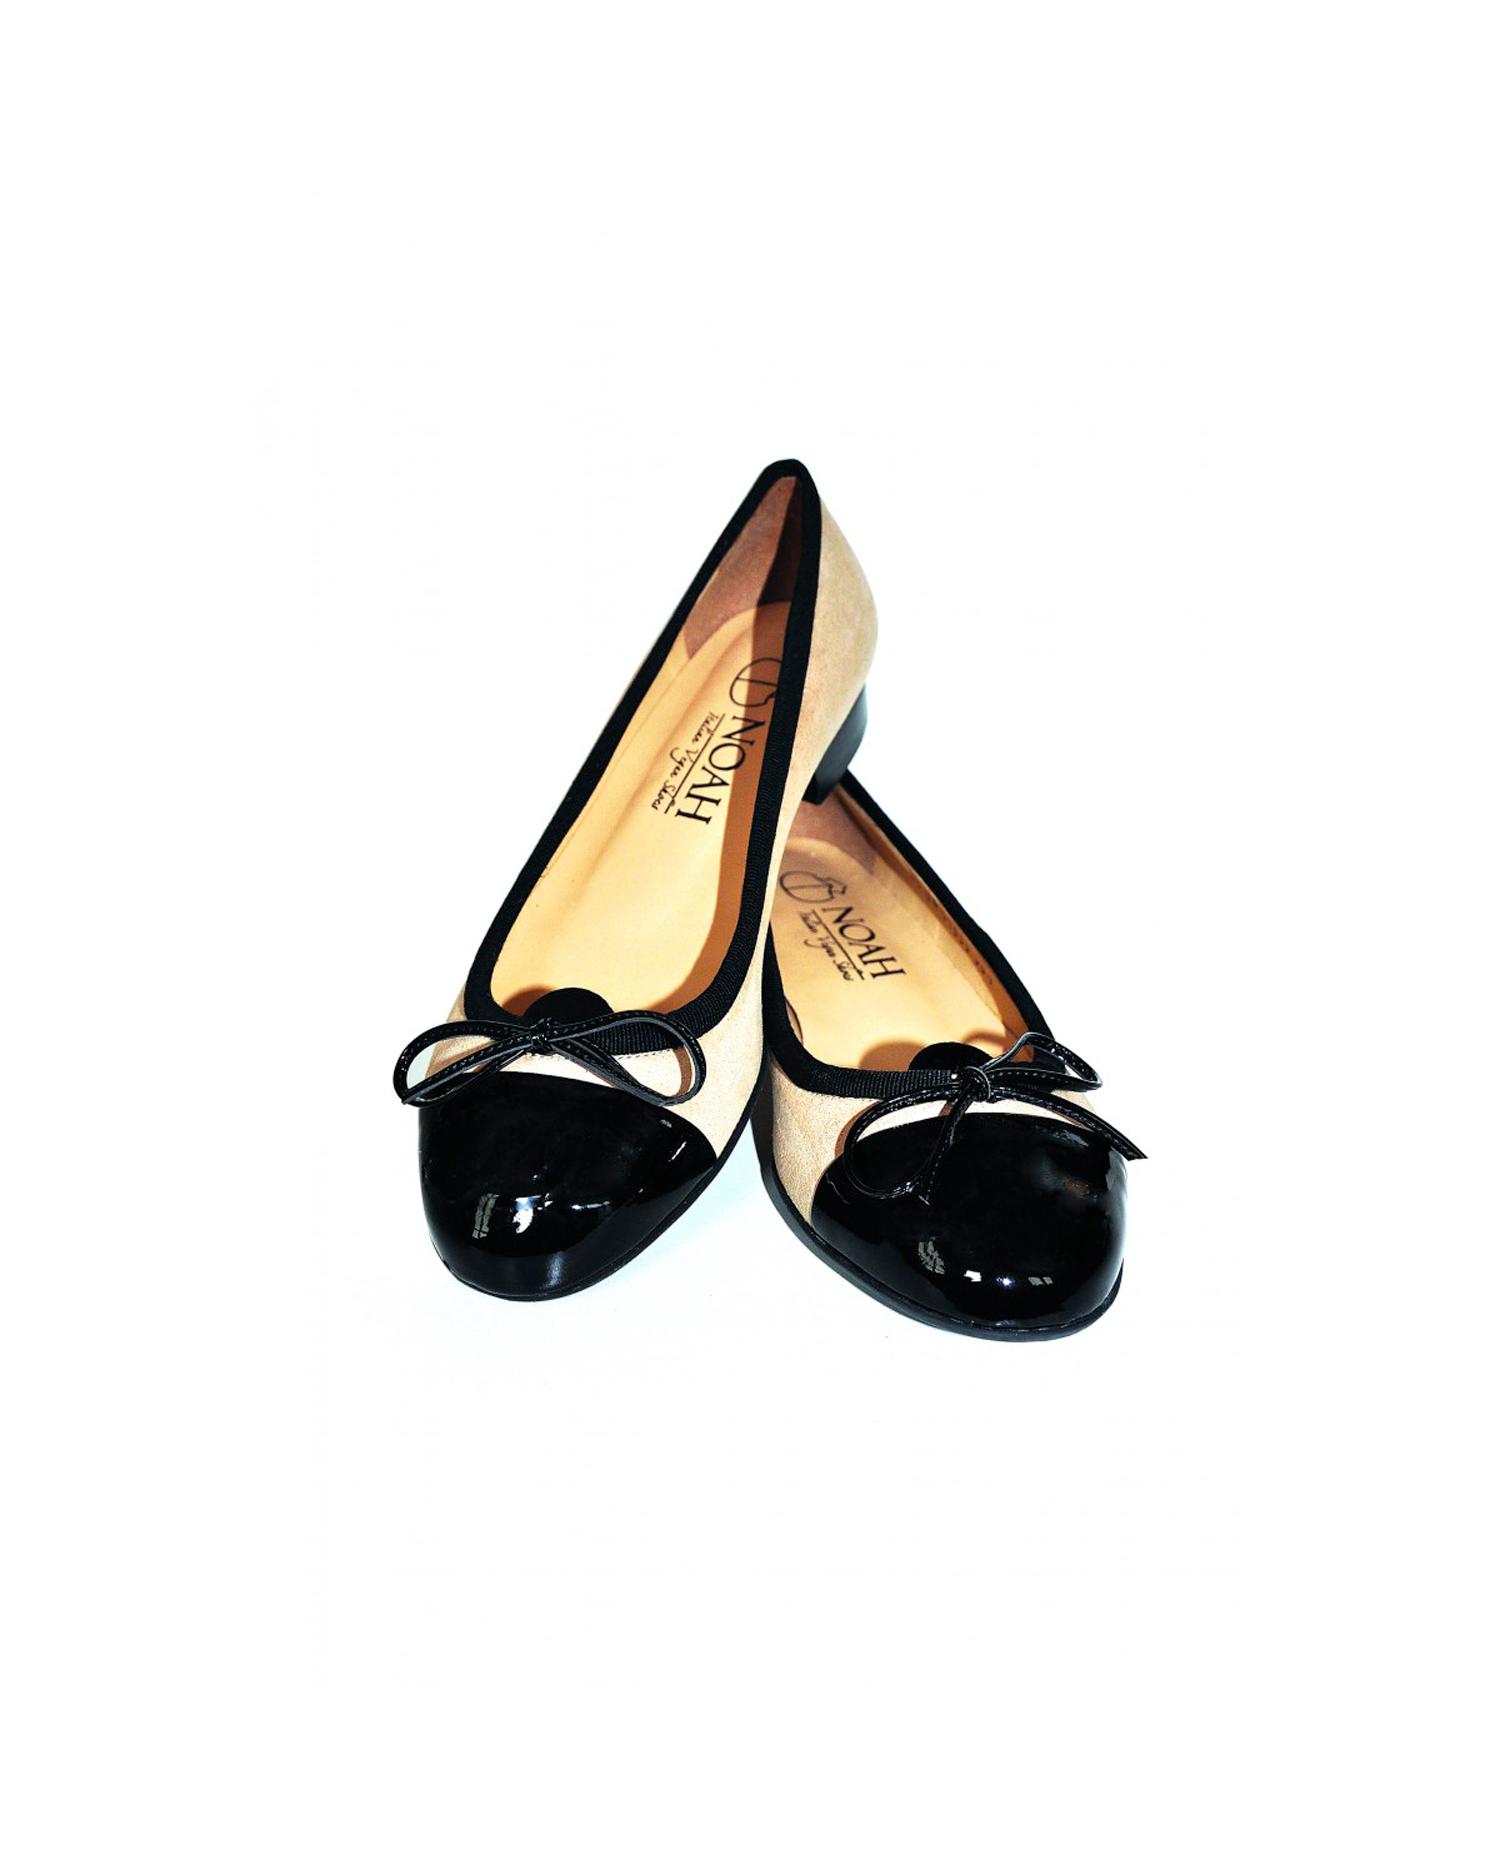 Noah Italian Vegan Shoes Catherine Ballet Flats